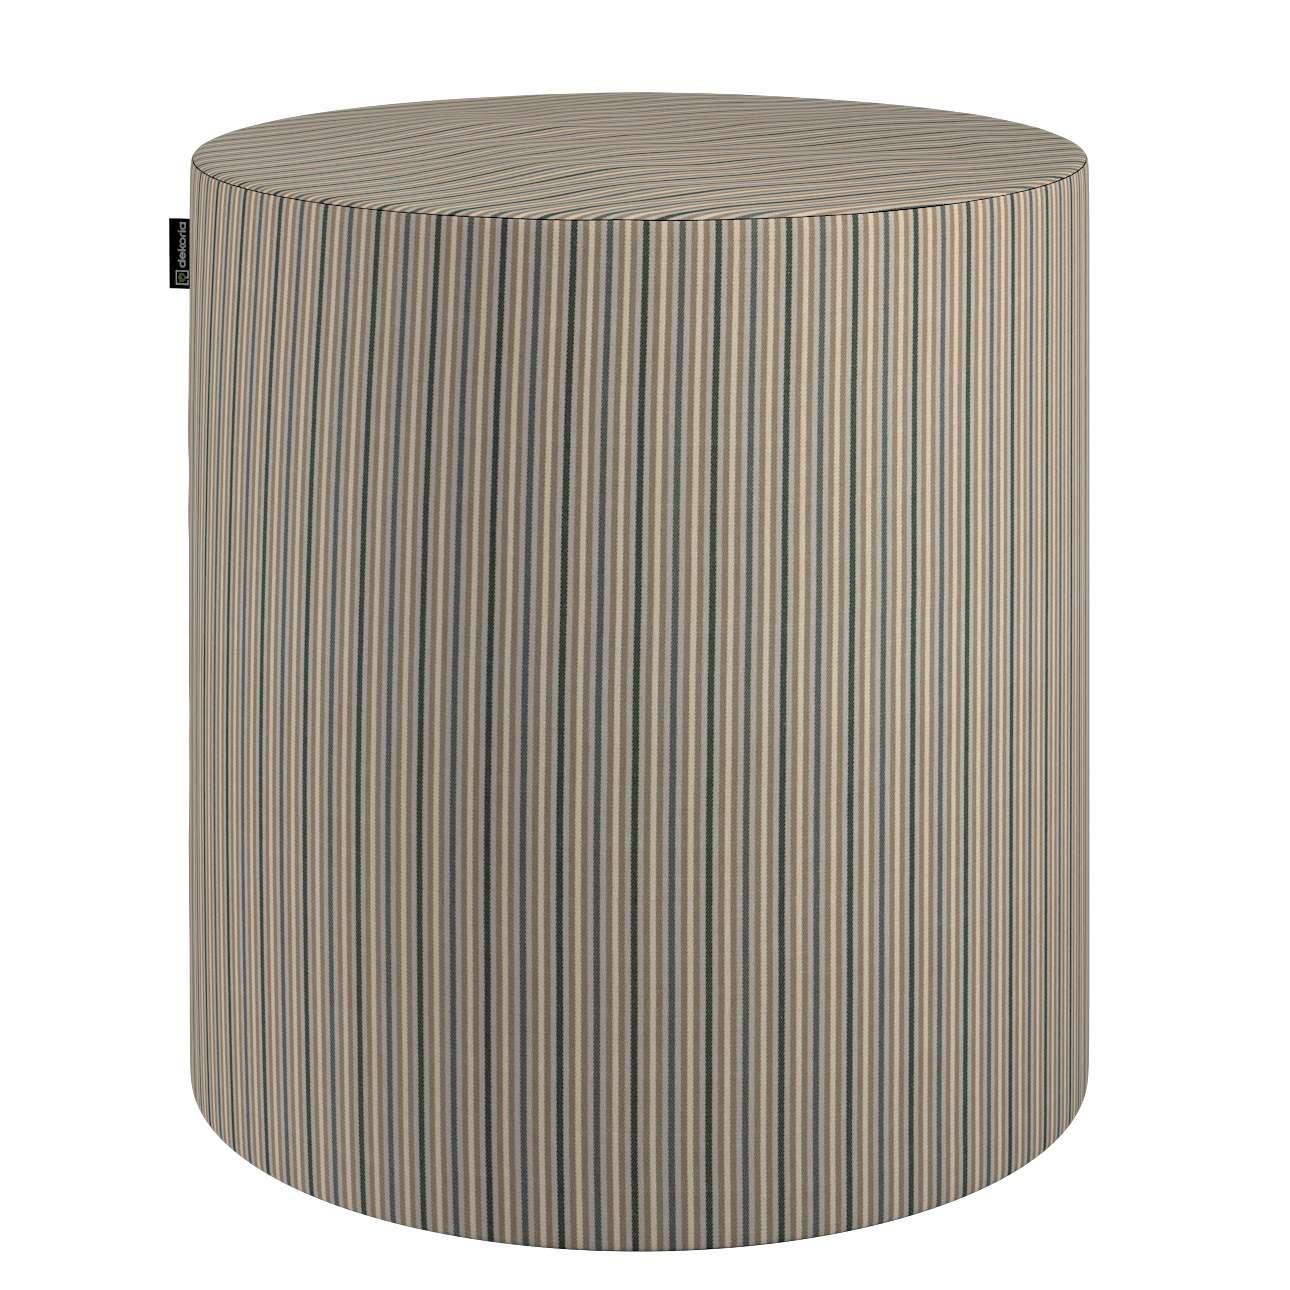 Pouf Barrel von der Kollektion Londres, Stoff: 143-38